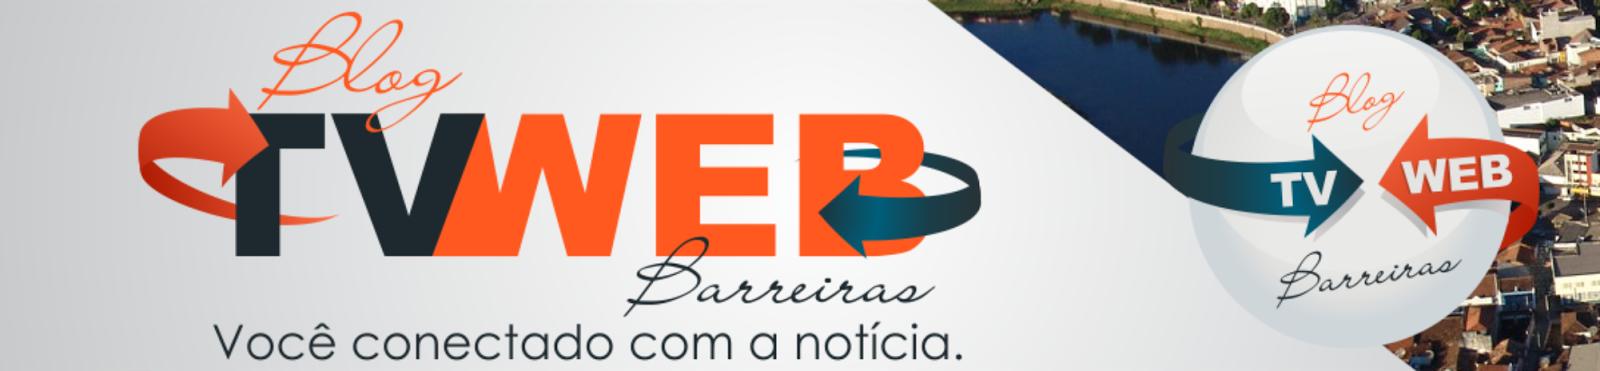 Tv Web Barreiras